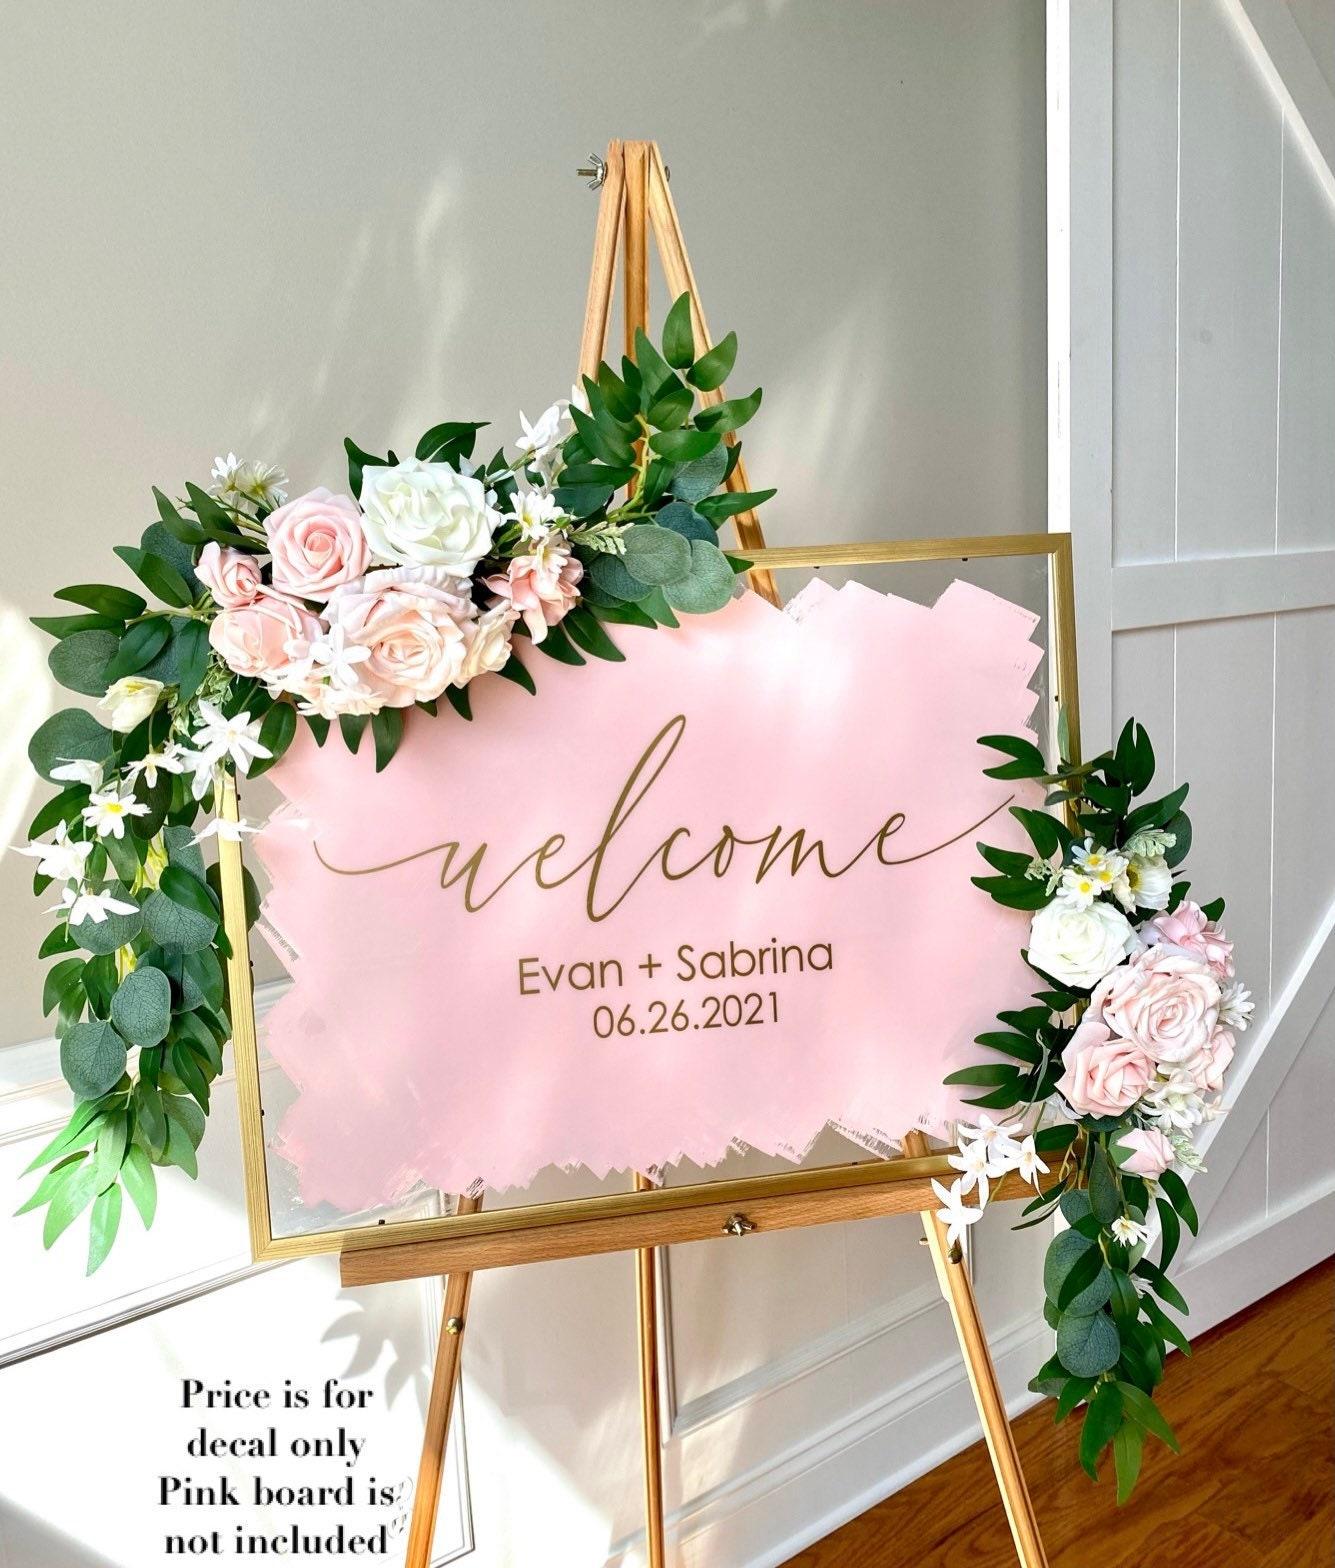 Mirror Plexiglass Vinyl Decal Sticker Hashtag Shower Wedding chalkboard Unplugged ceremony Personalised DIY Sign Couples Initials